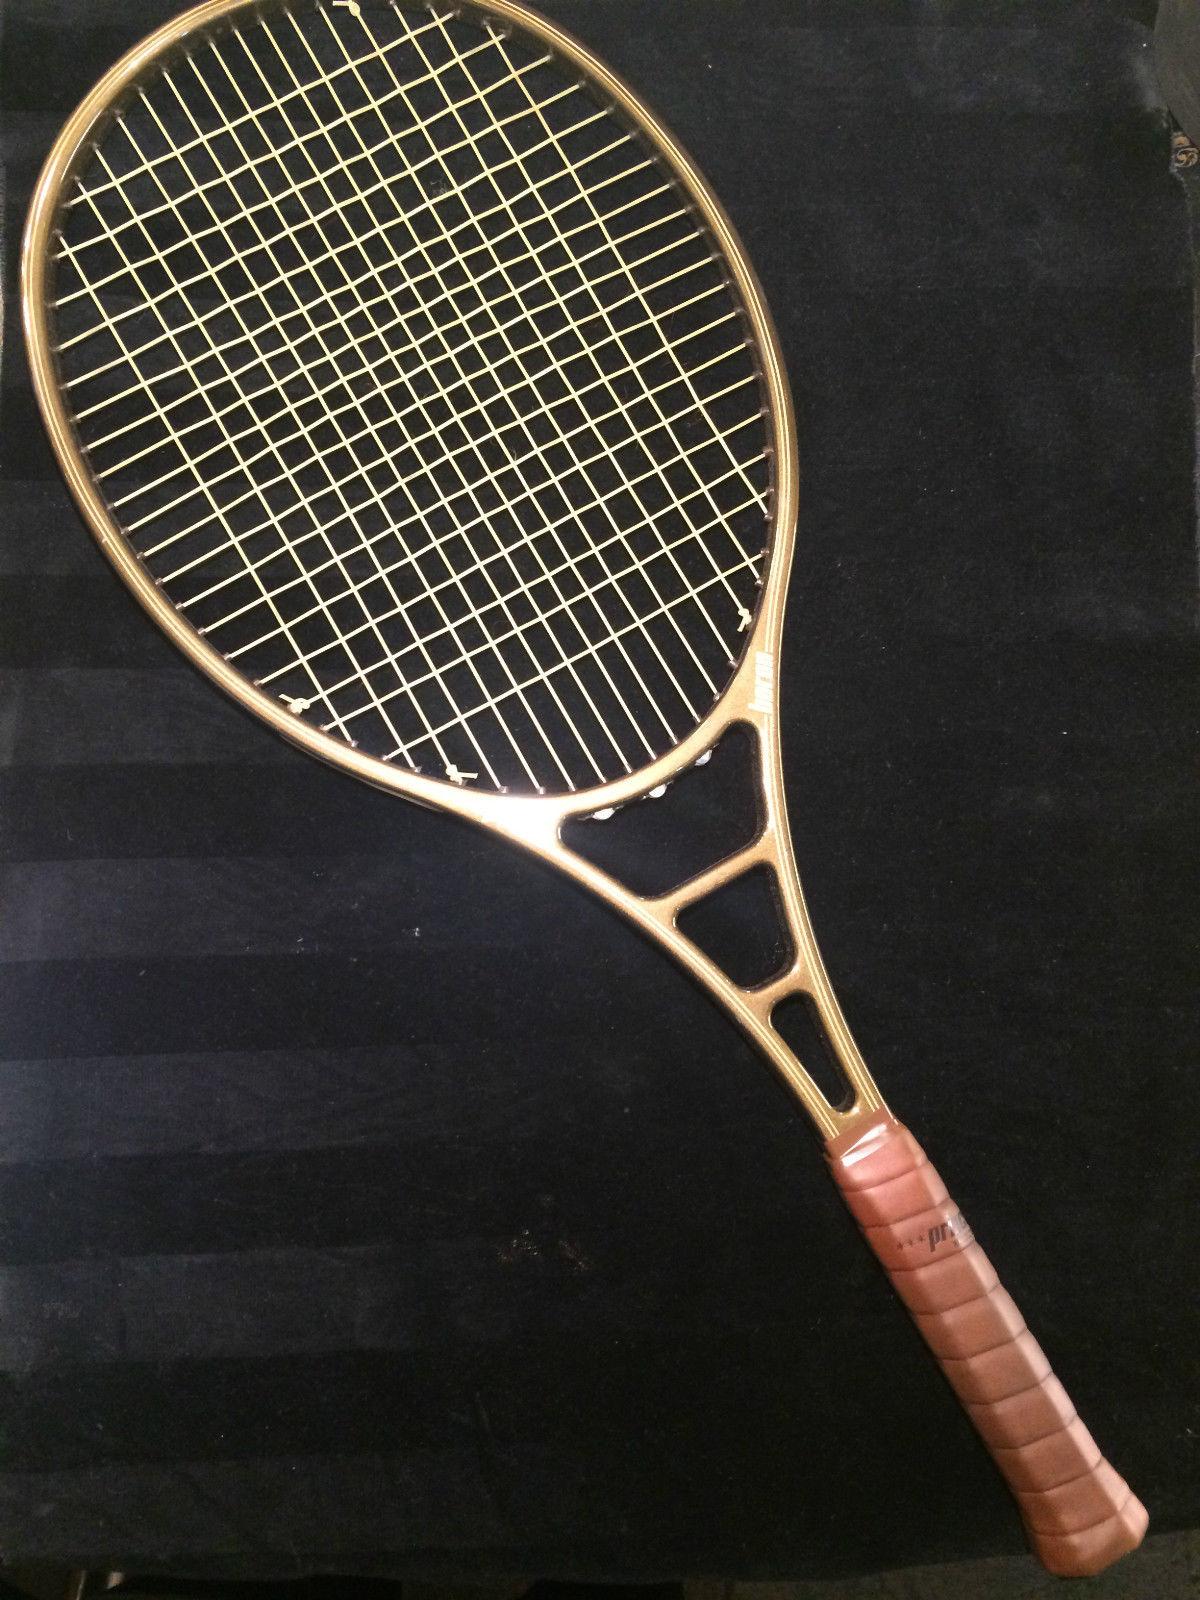 Vintage Prince Boron Tennis Racket Modernism